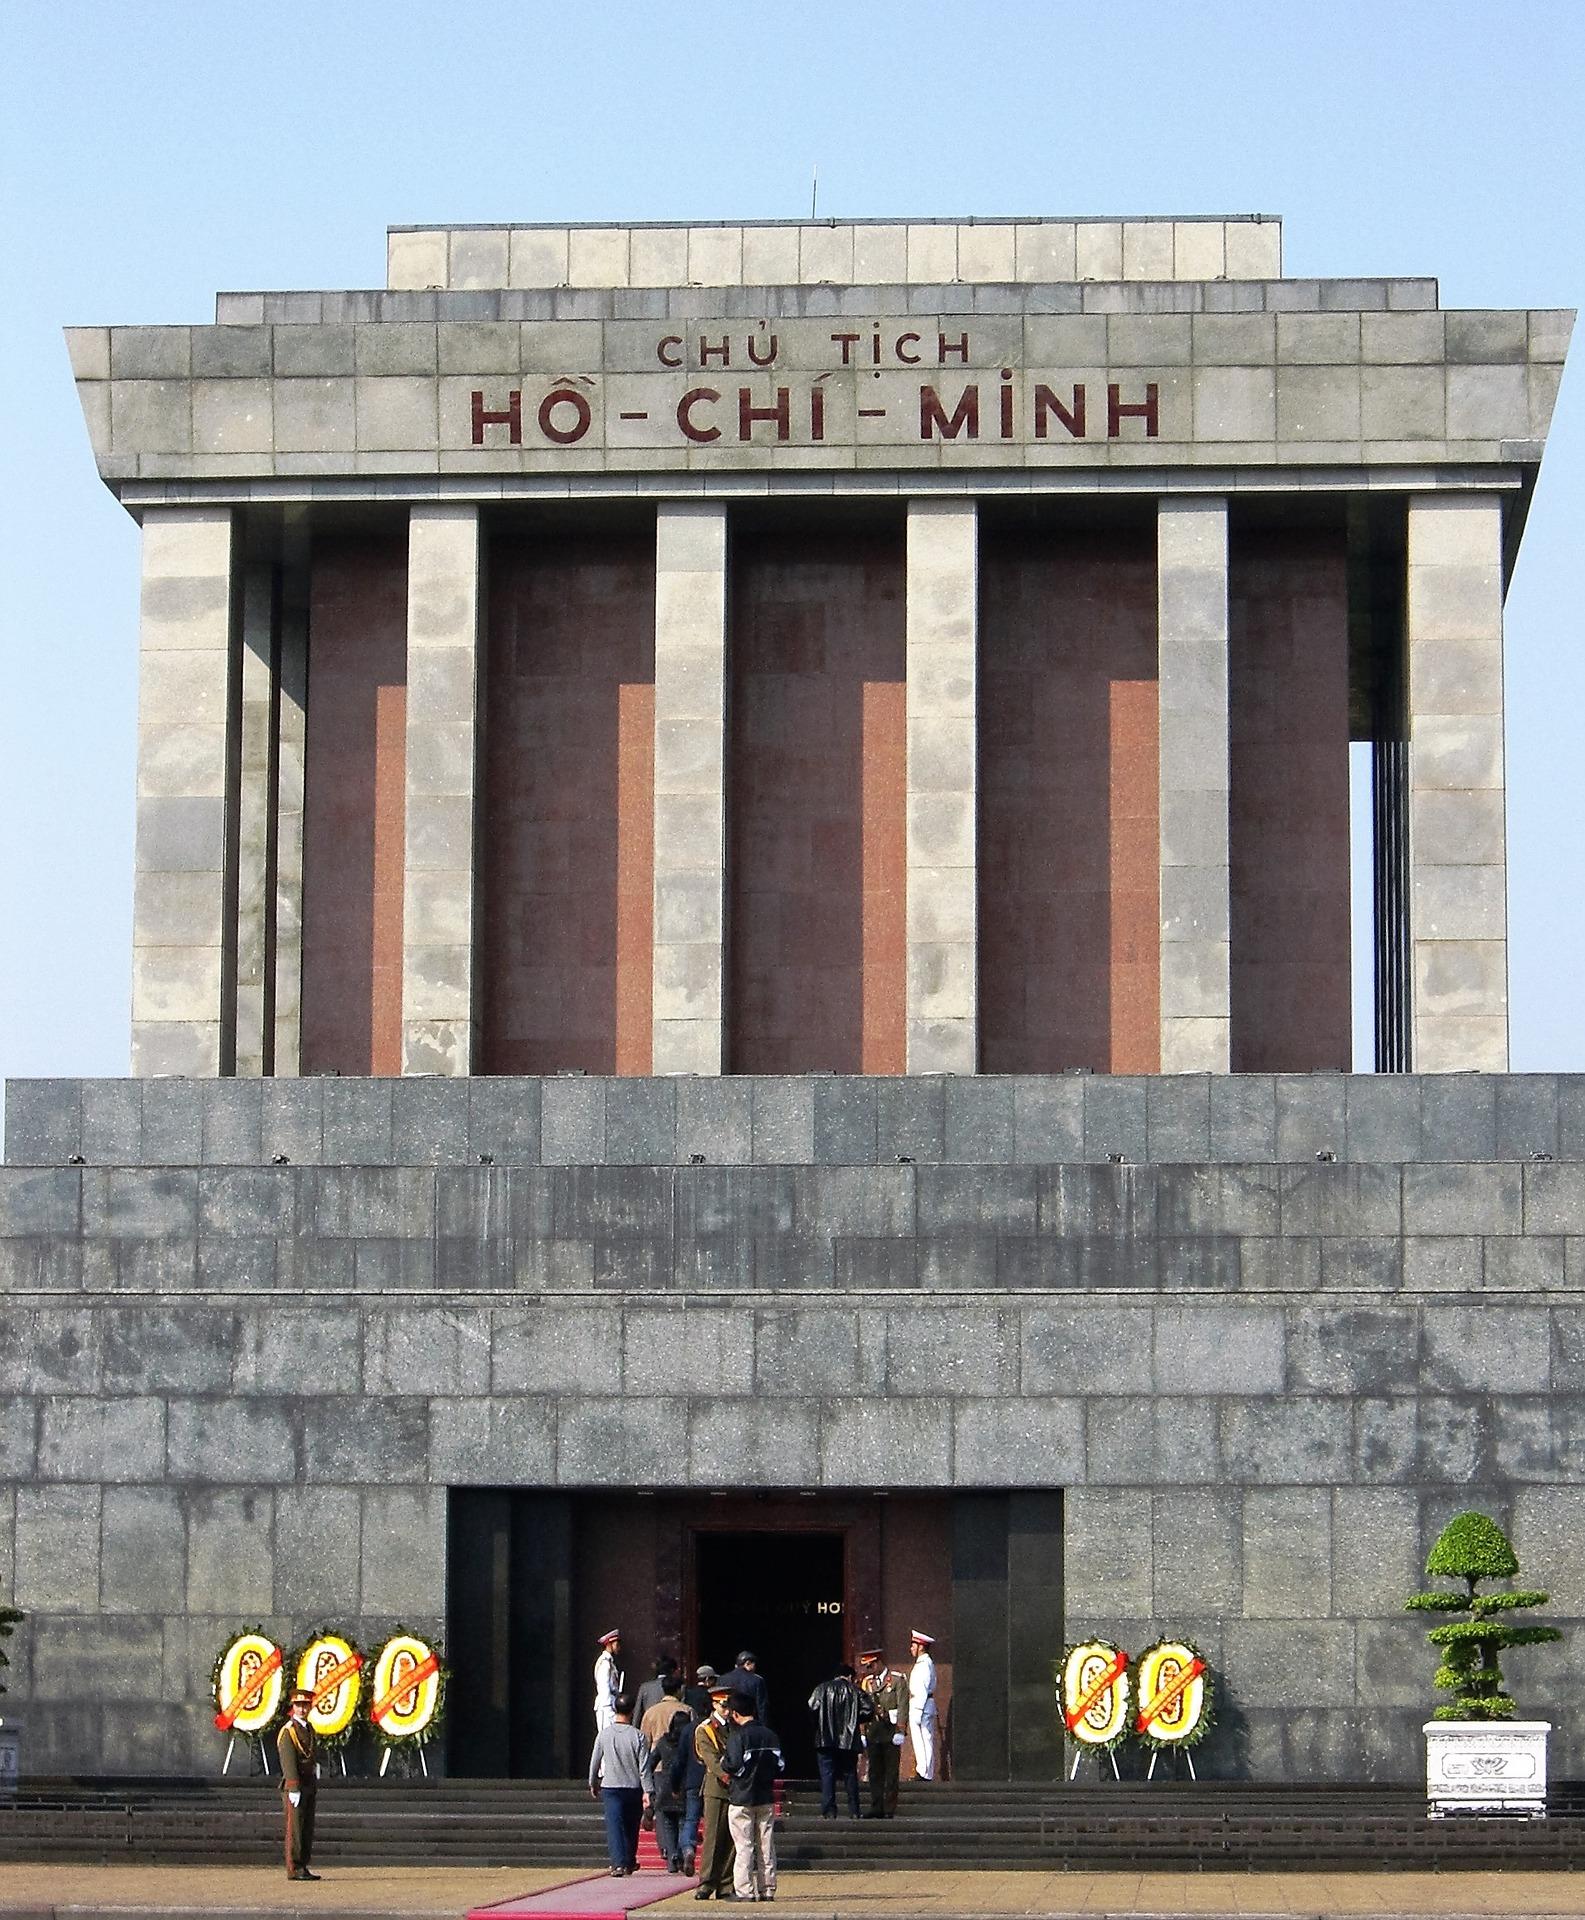 Mausoleum Hanoi - Ho Chi Minh